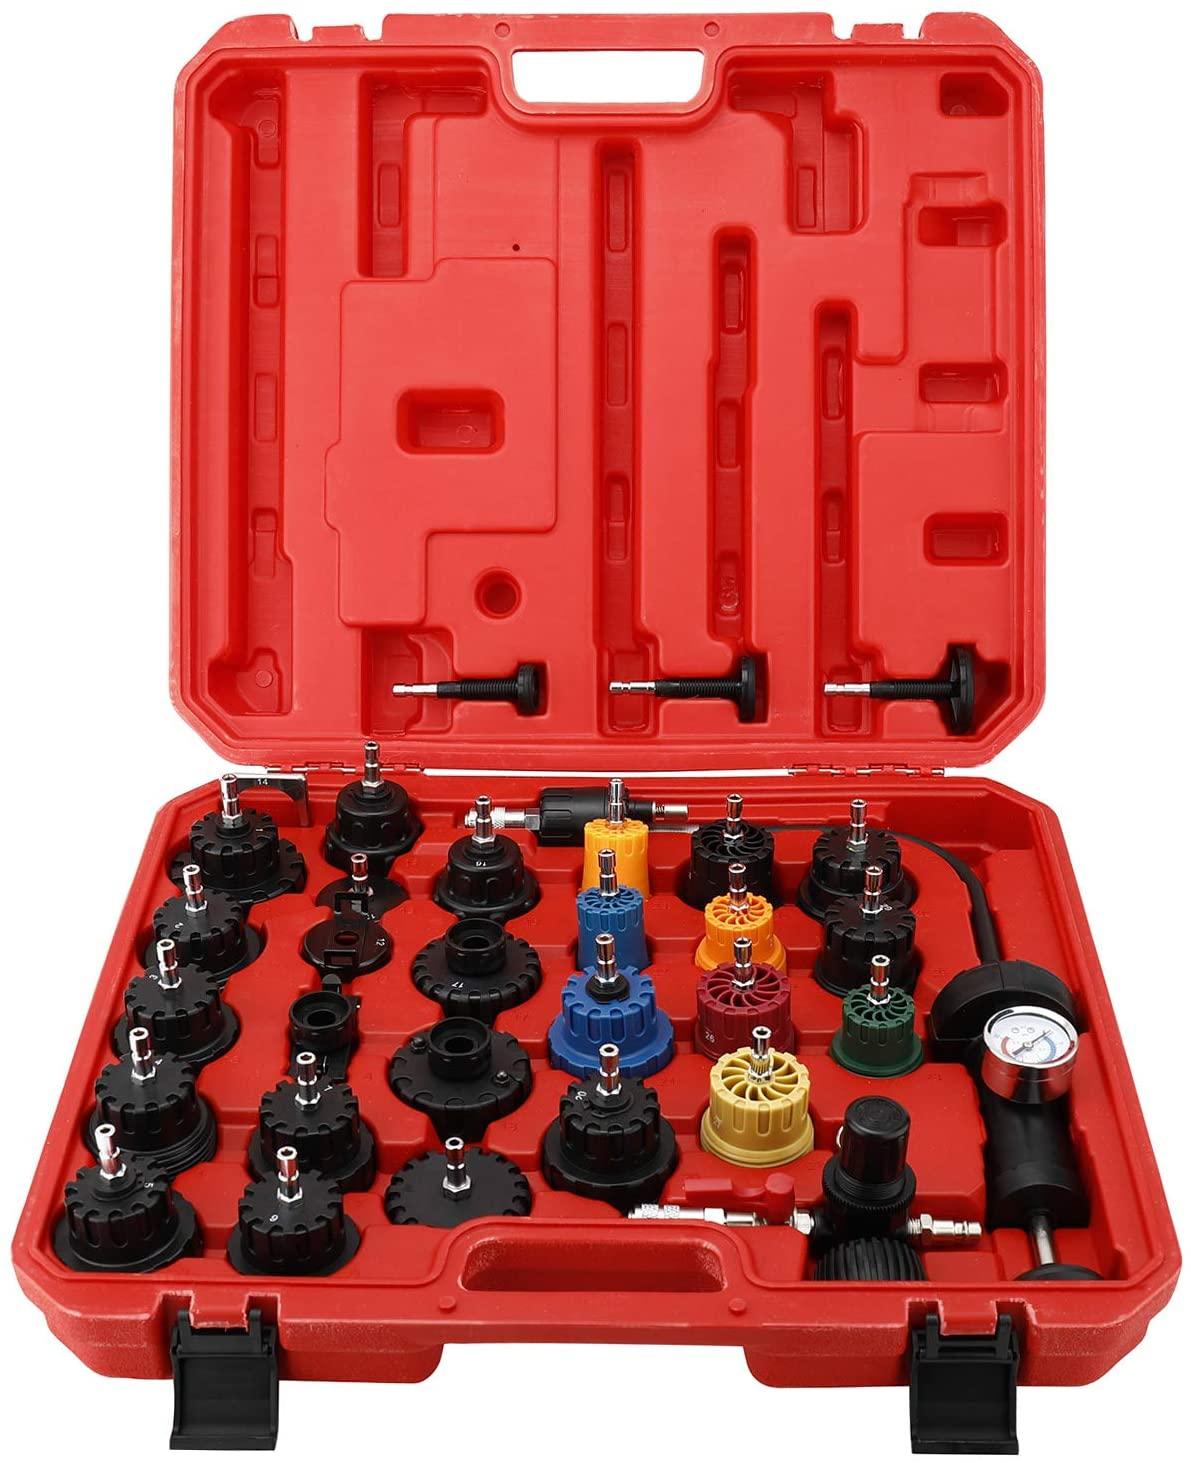 8MILELAKE 33Pcs Radiator and Cap Pressure Tester Kit